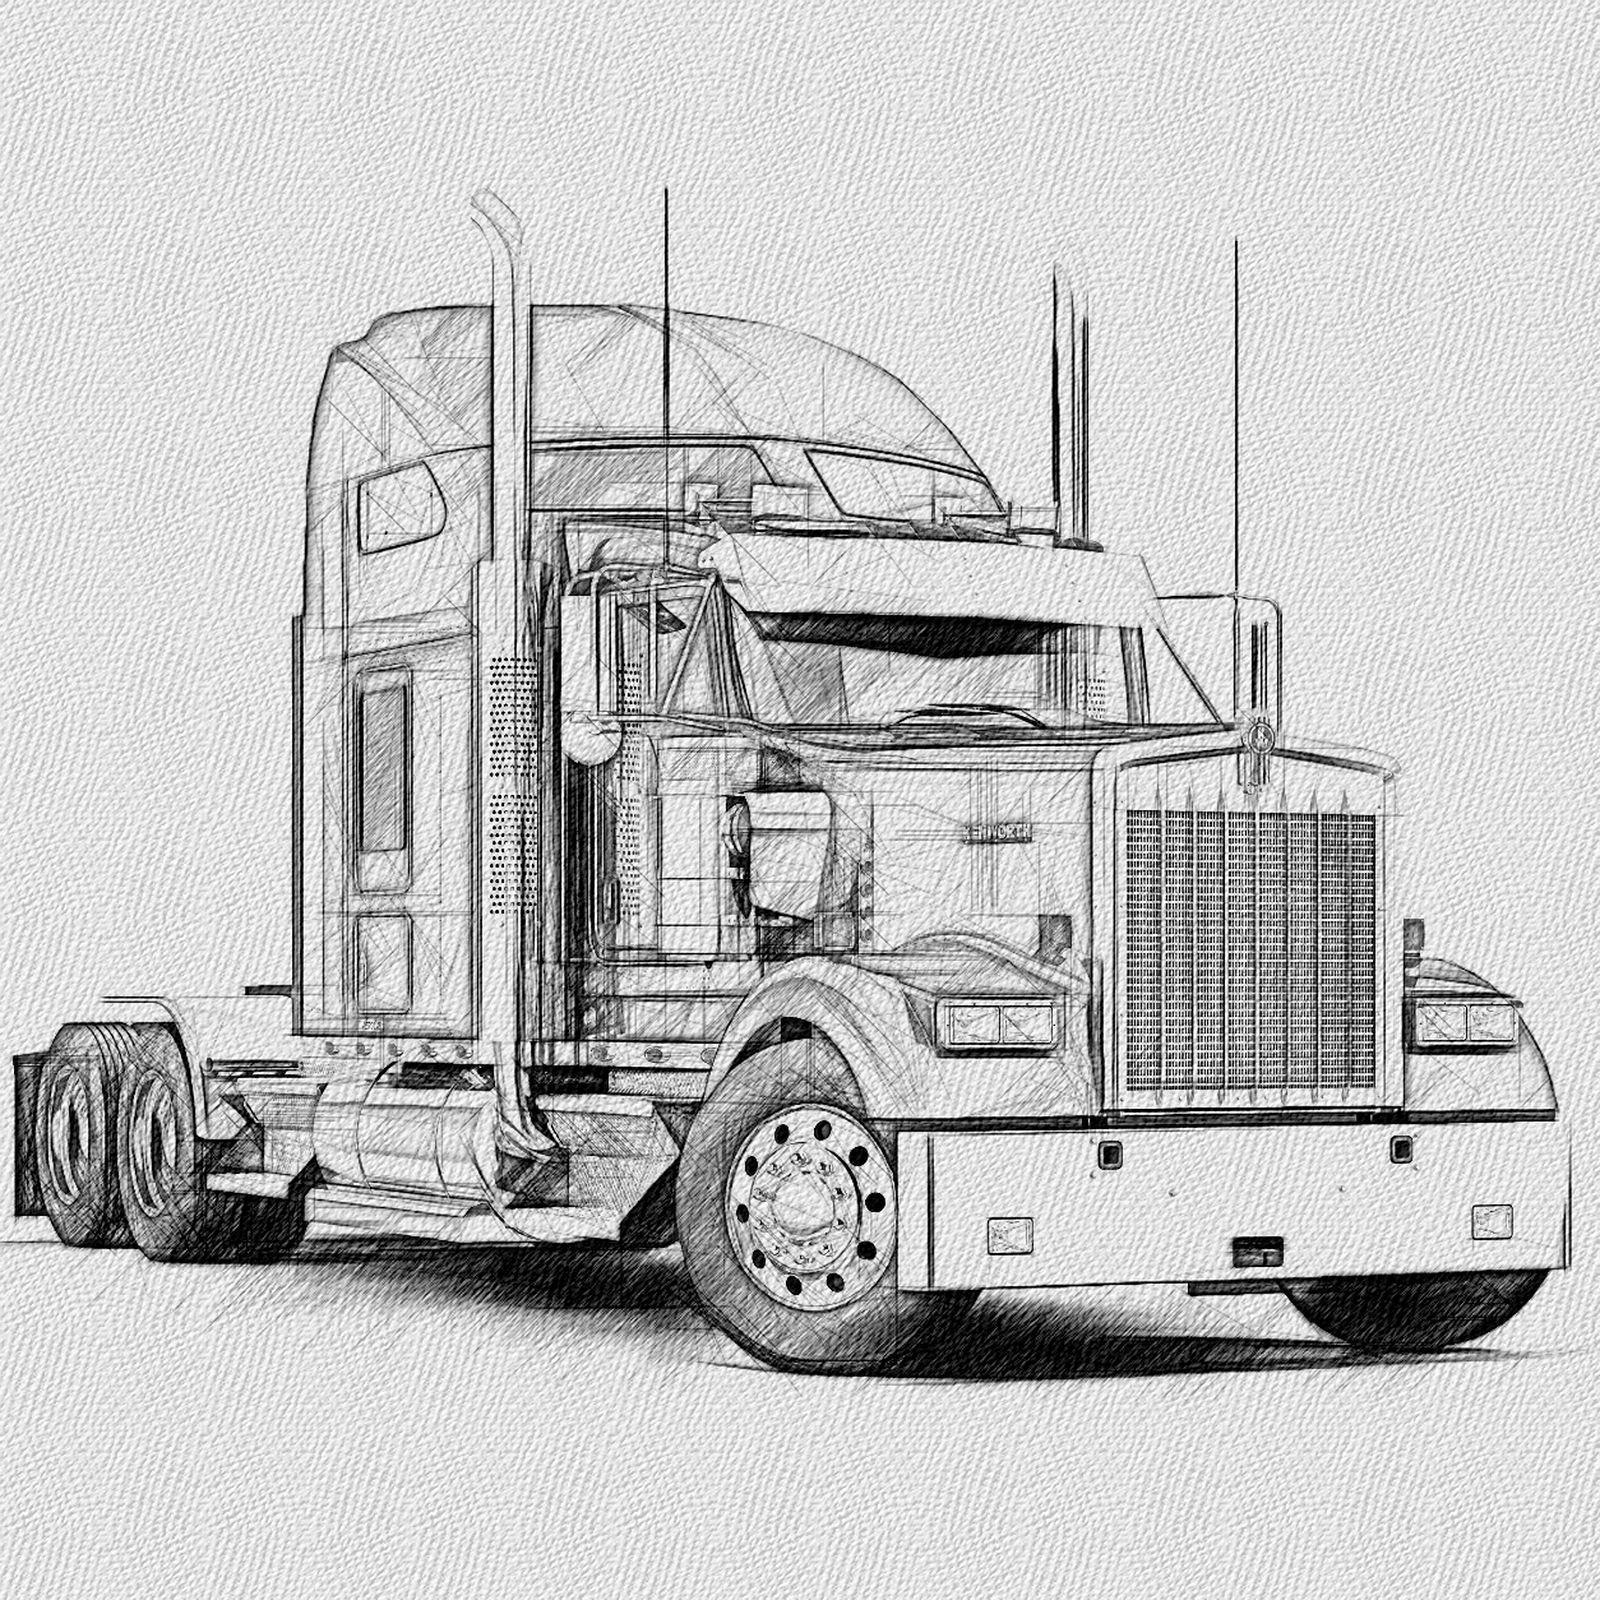 Kenworth Tractor Cab Rh Frt Kenworth Trucks Truck Art Bike Illustration